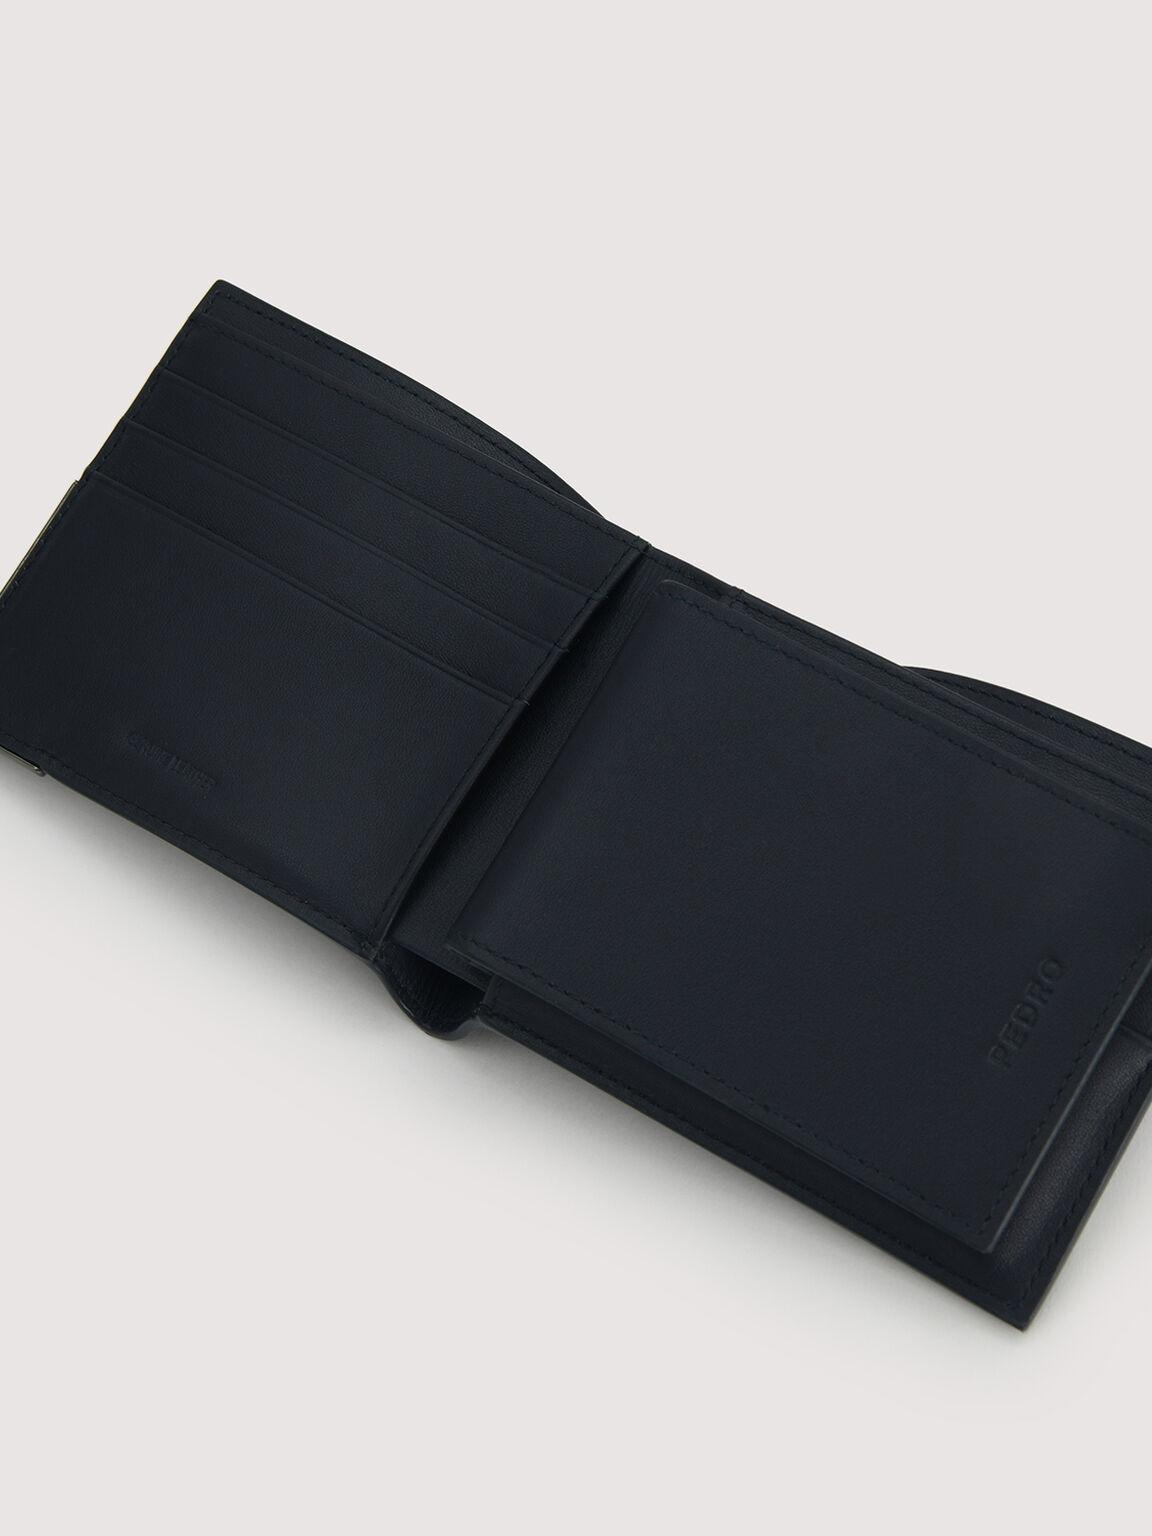 Leather Bi-Fold with Flip, Navy, hi-res